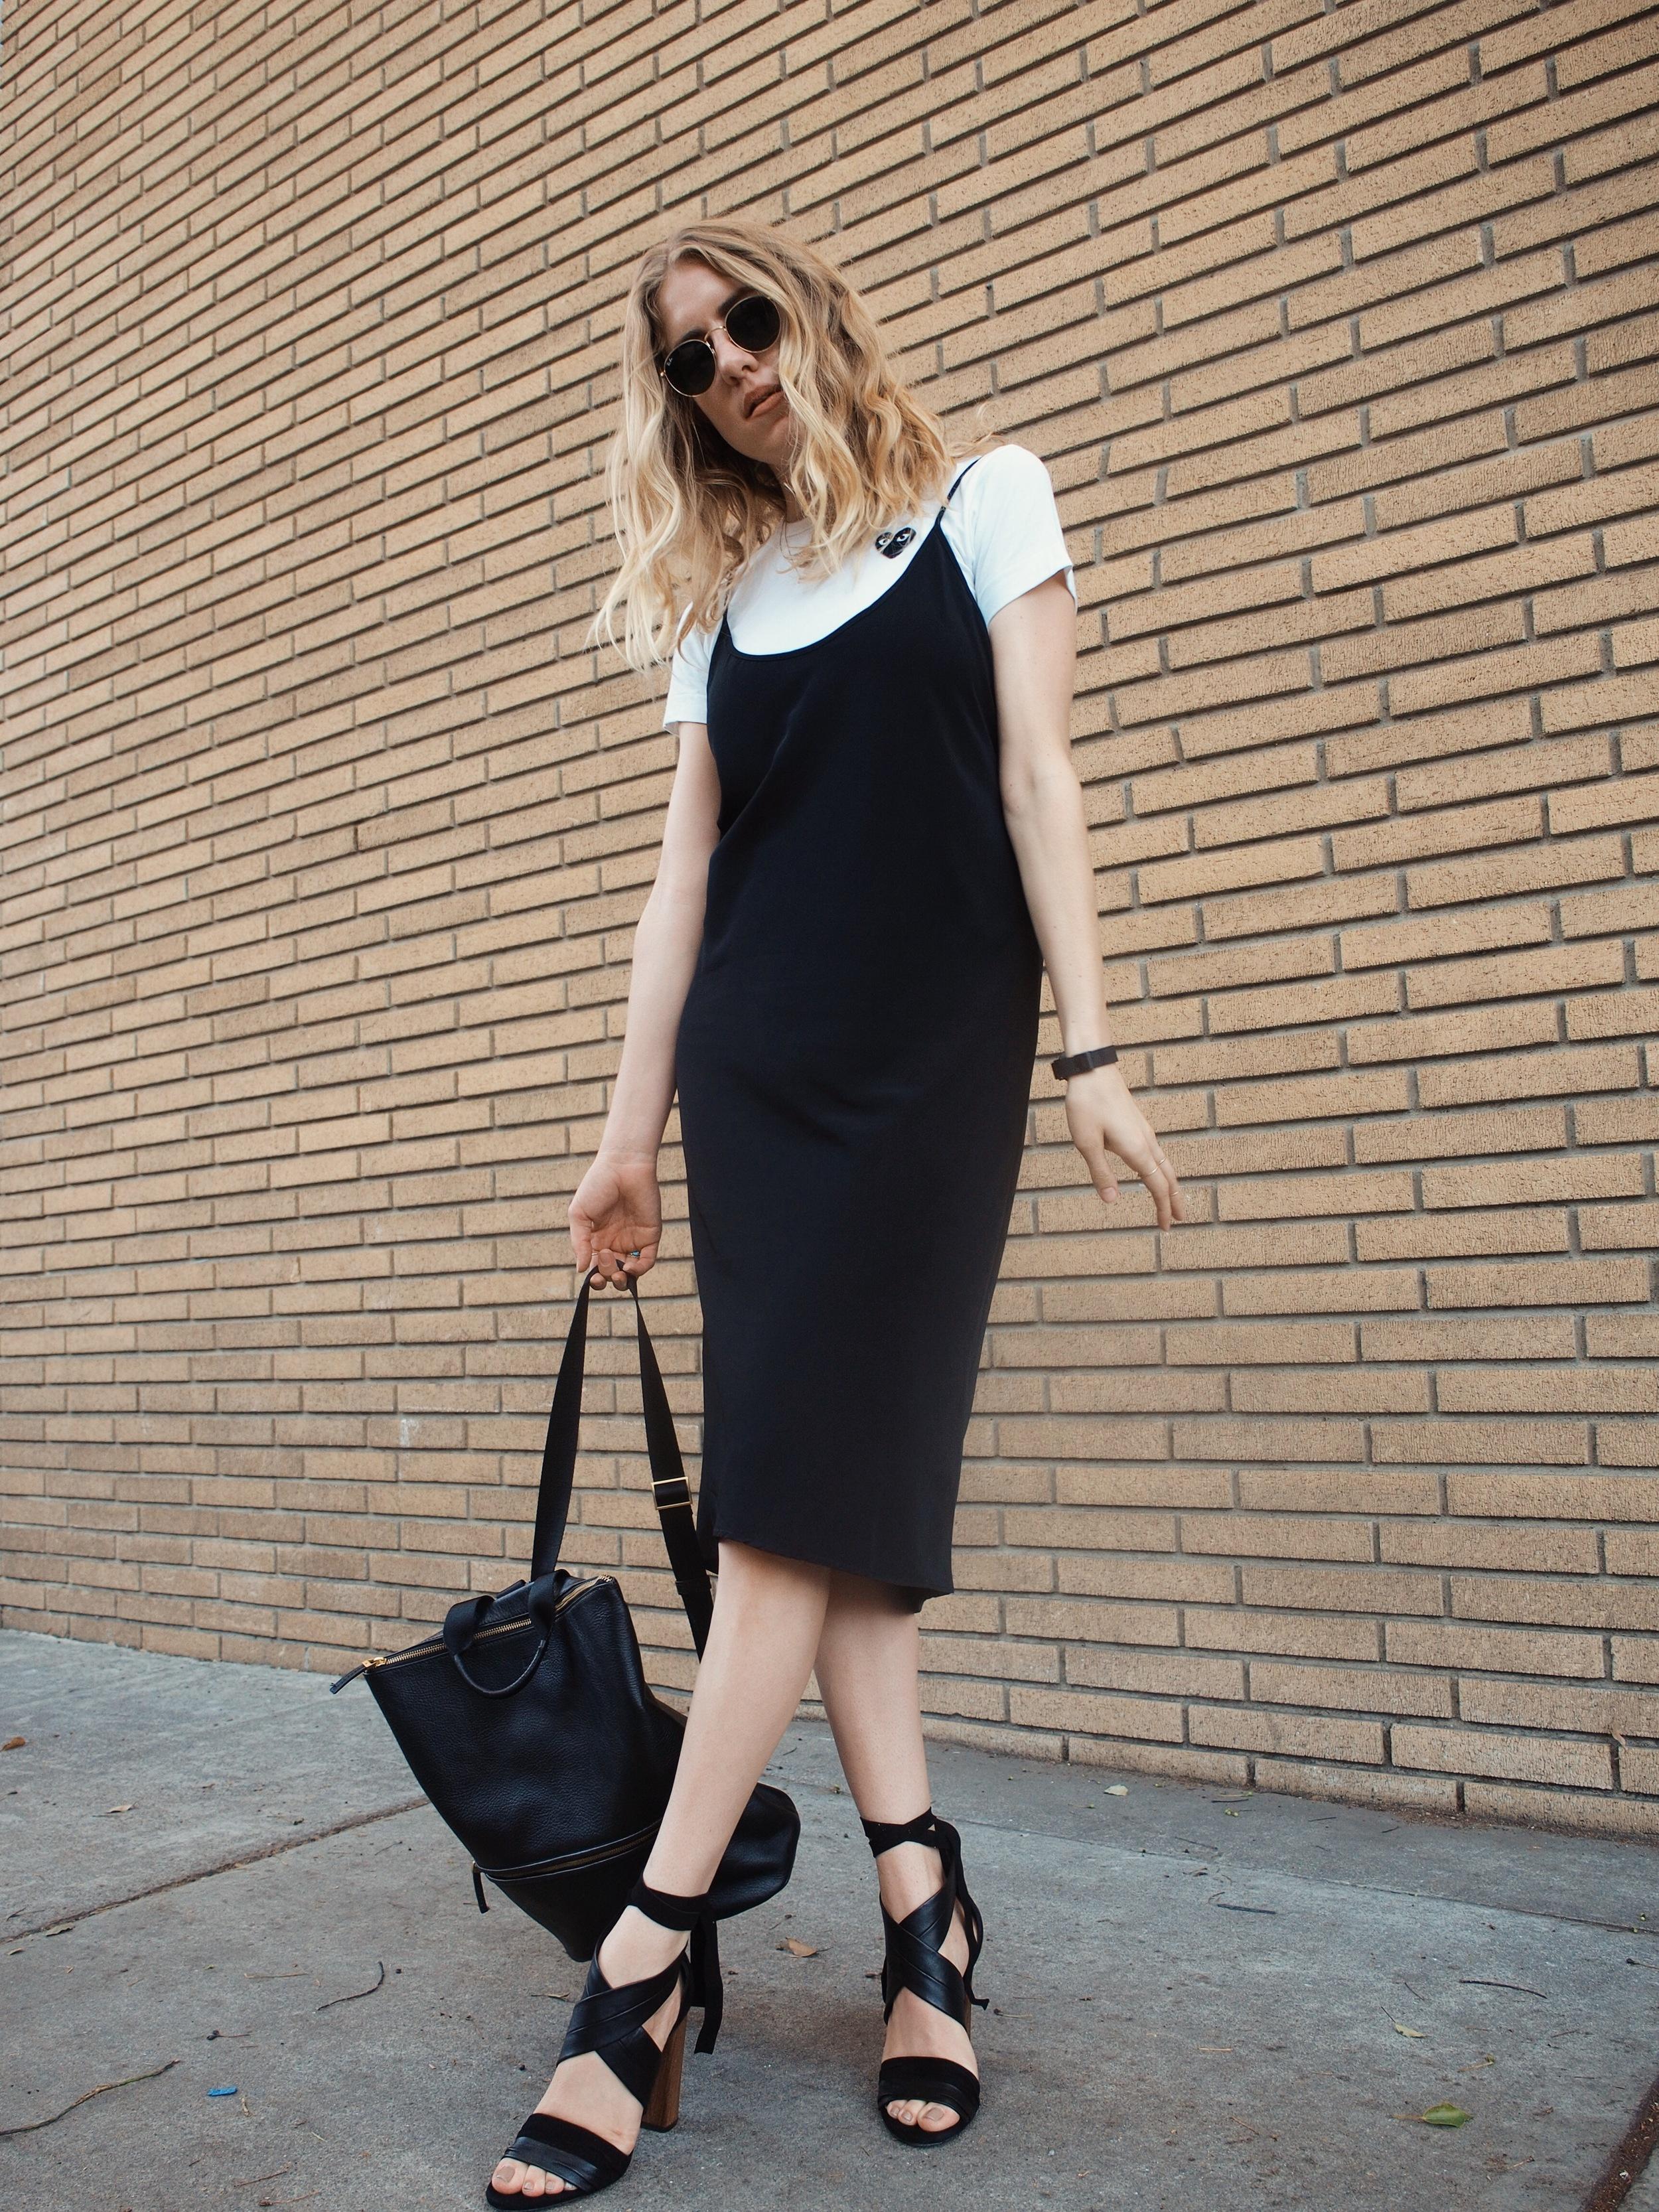 Comme des Garçons Basic Tee The Sept Label Slip Dress Vince Beatrice Sandal Hare+Hart Backpack Street Style Taylr Anne www.taylranne.com